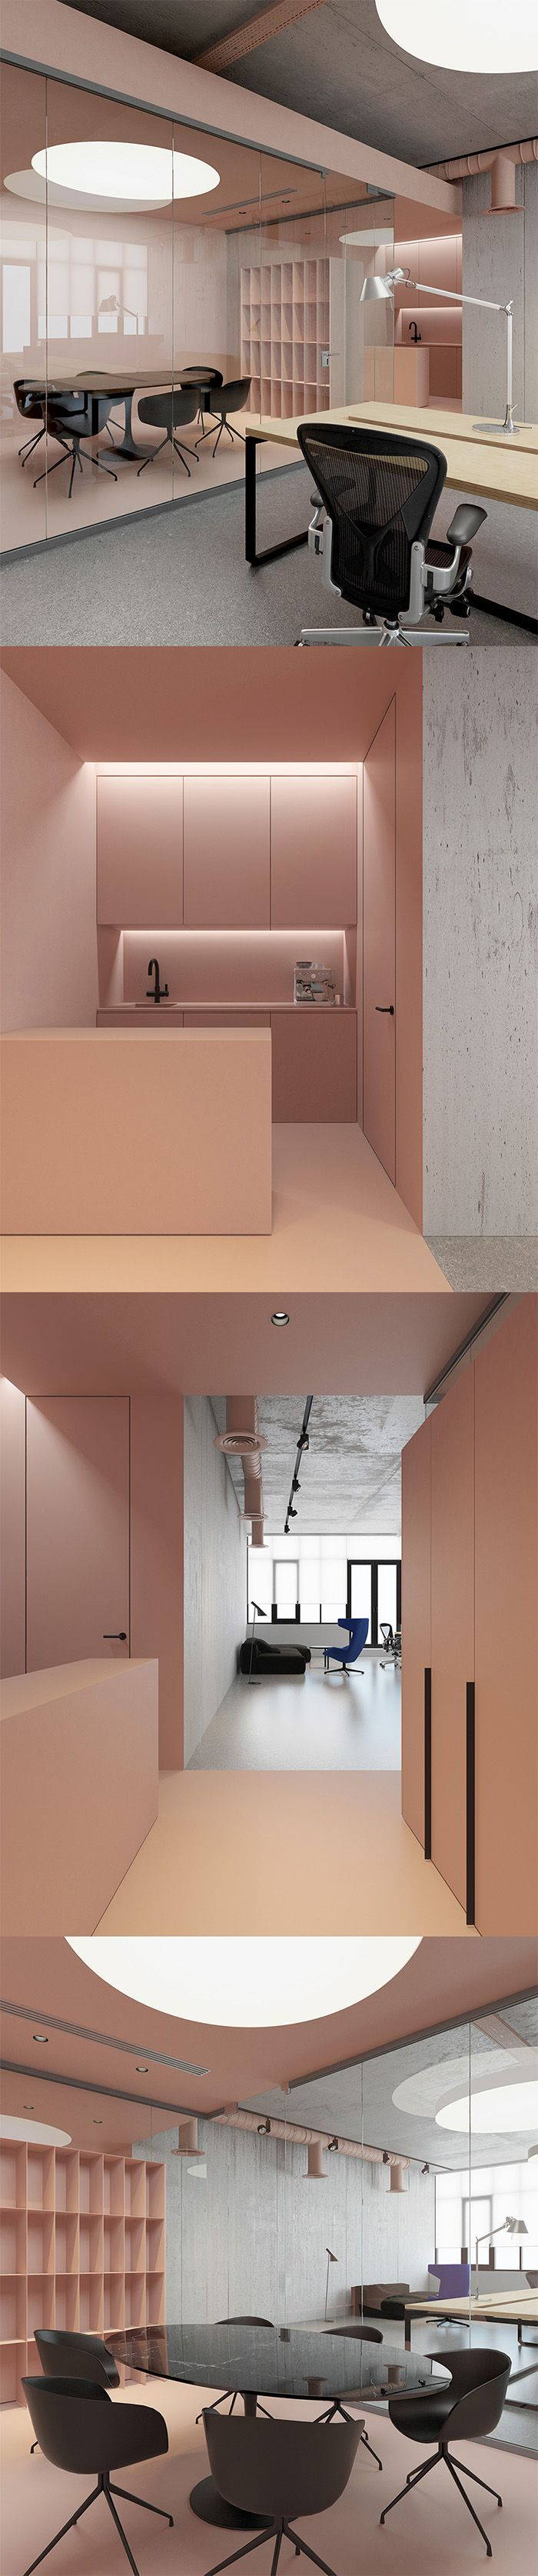 Creative partition ideas courtesy interior architect mohamed amer - Office P Kiev Ukraine